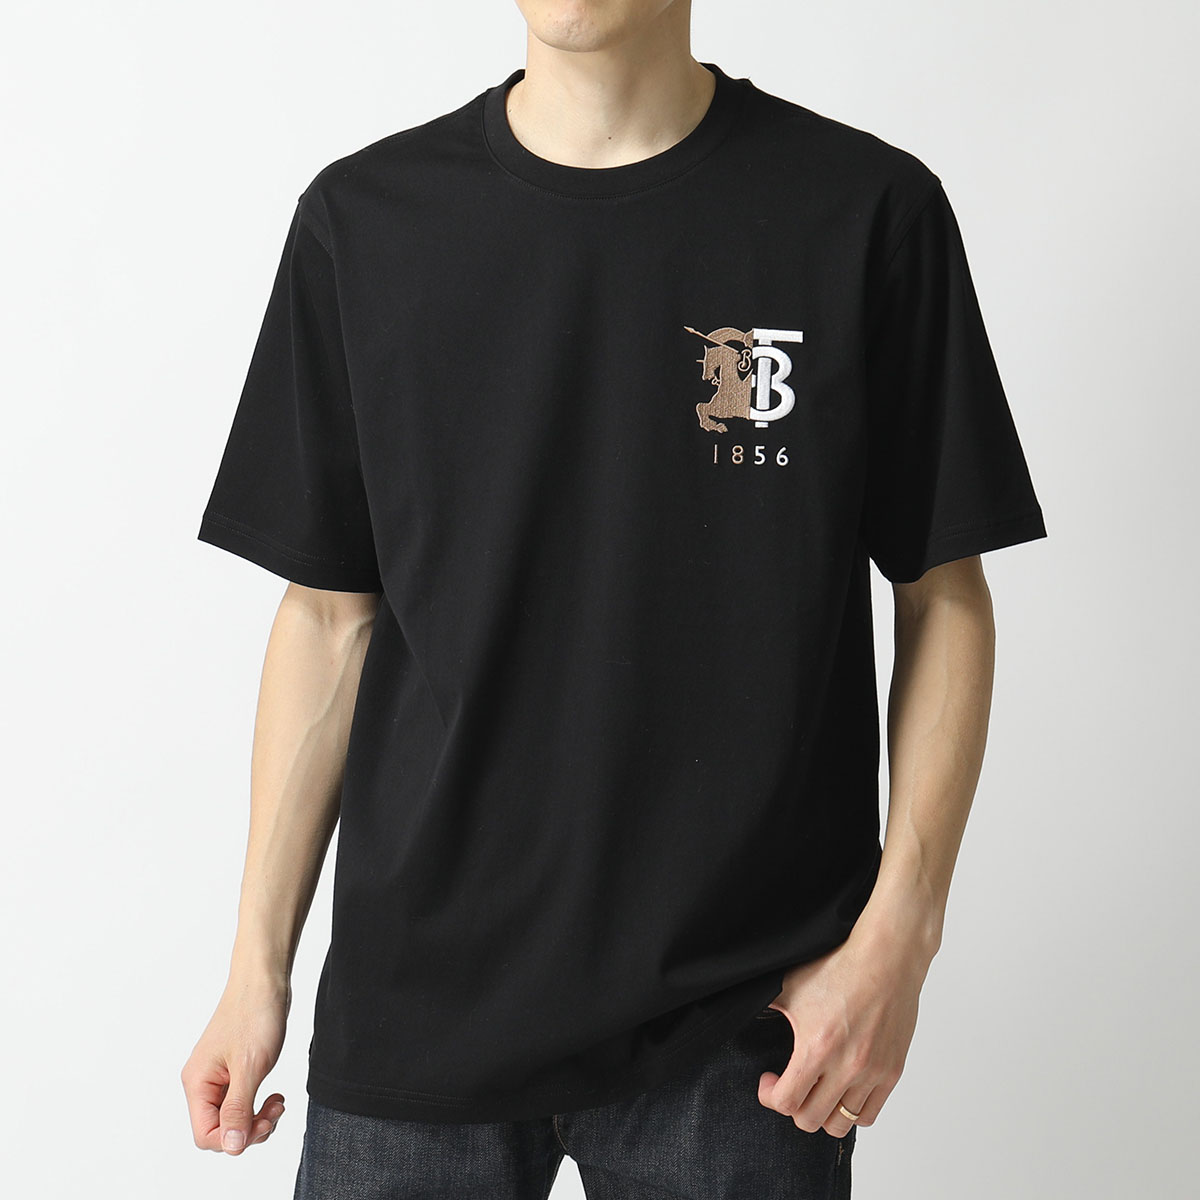 BURBERRY バーバリー 8023785 1003 クルーネック 半袖 Tシャツ カットソー ロゴ 刺繍 BLACK メンズ